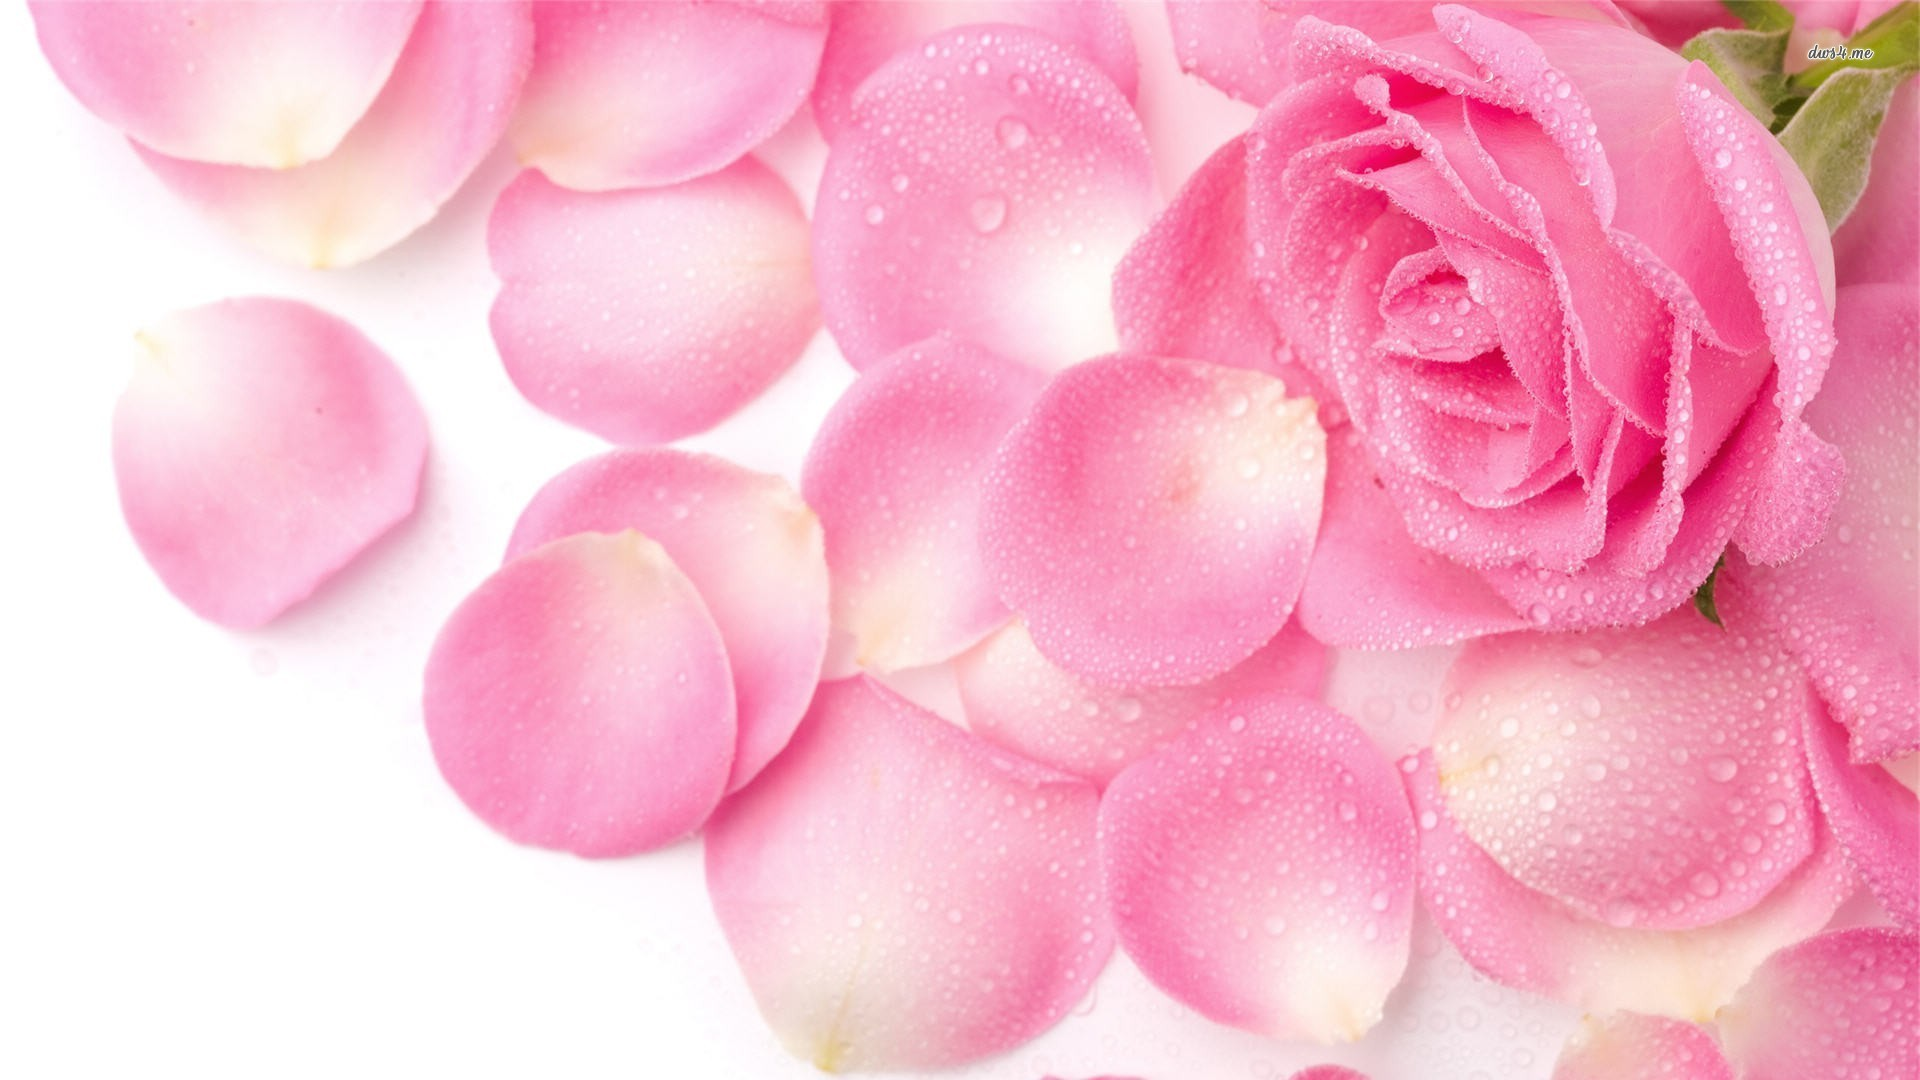 1920x1080 Hd Pics Photos Orange Rose Flowers Desktop Background Wallpaper